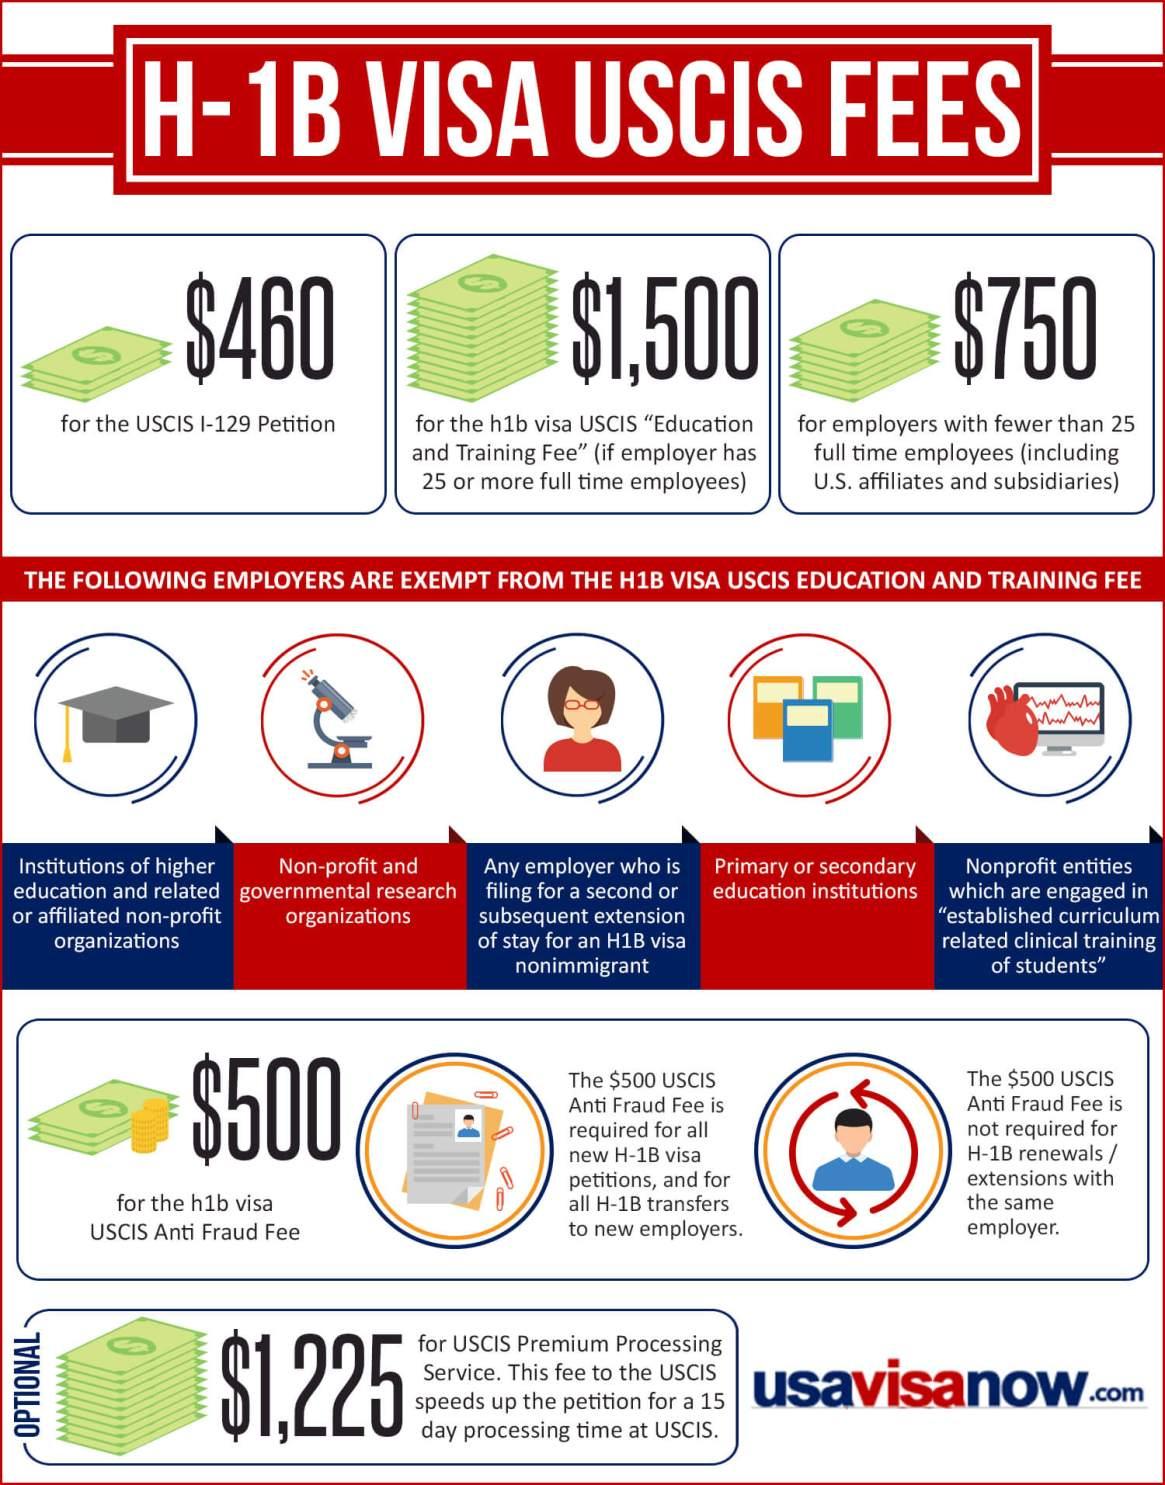 USCIS fees for H-1B Visa Processing